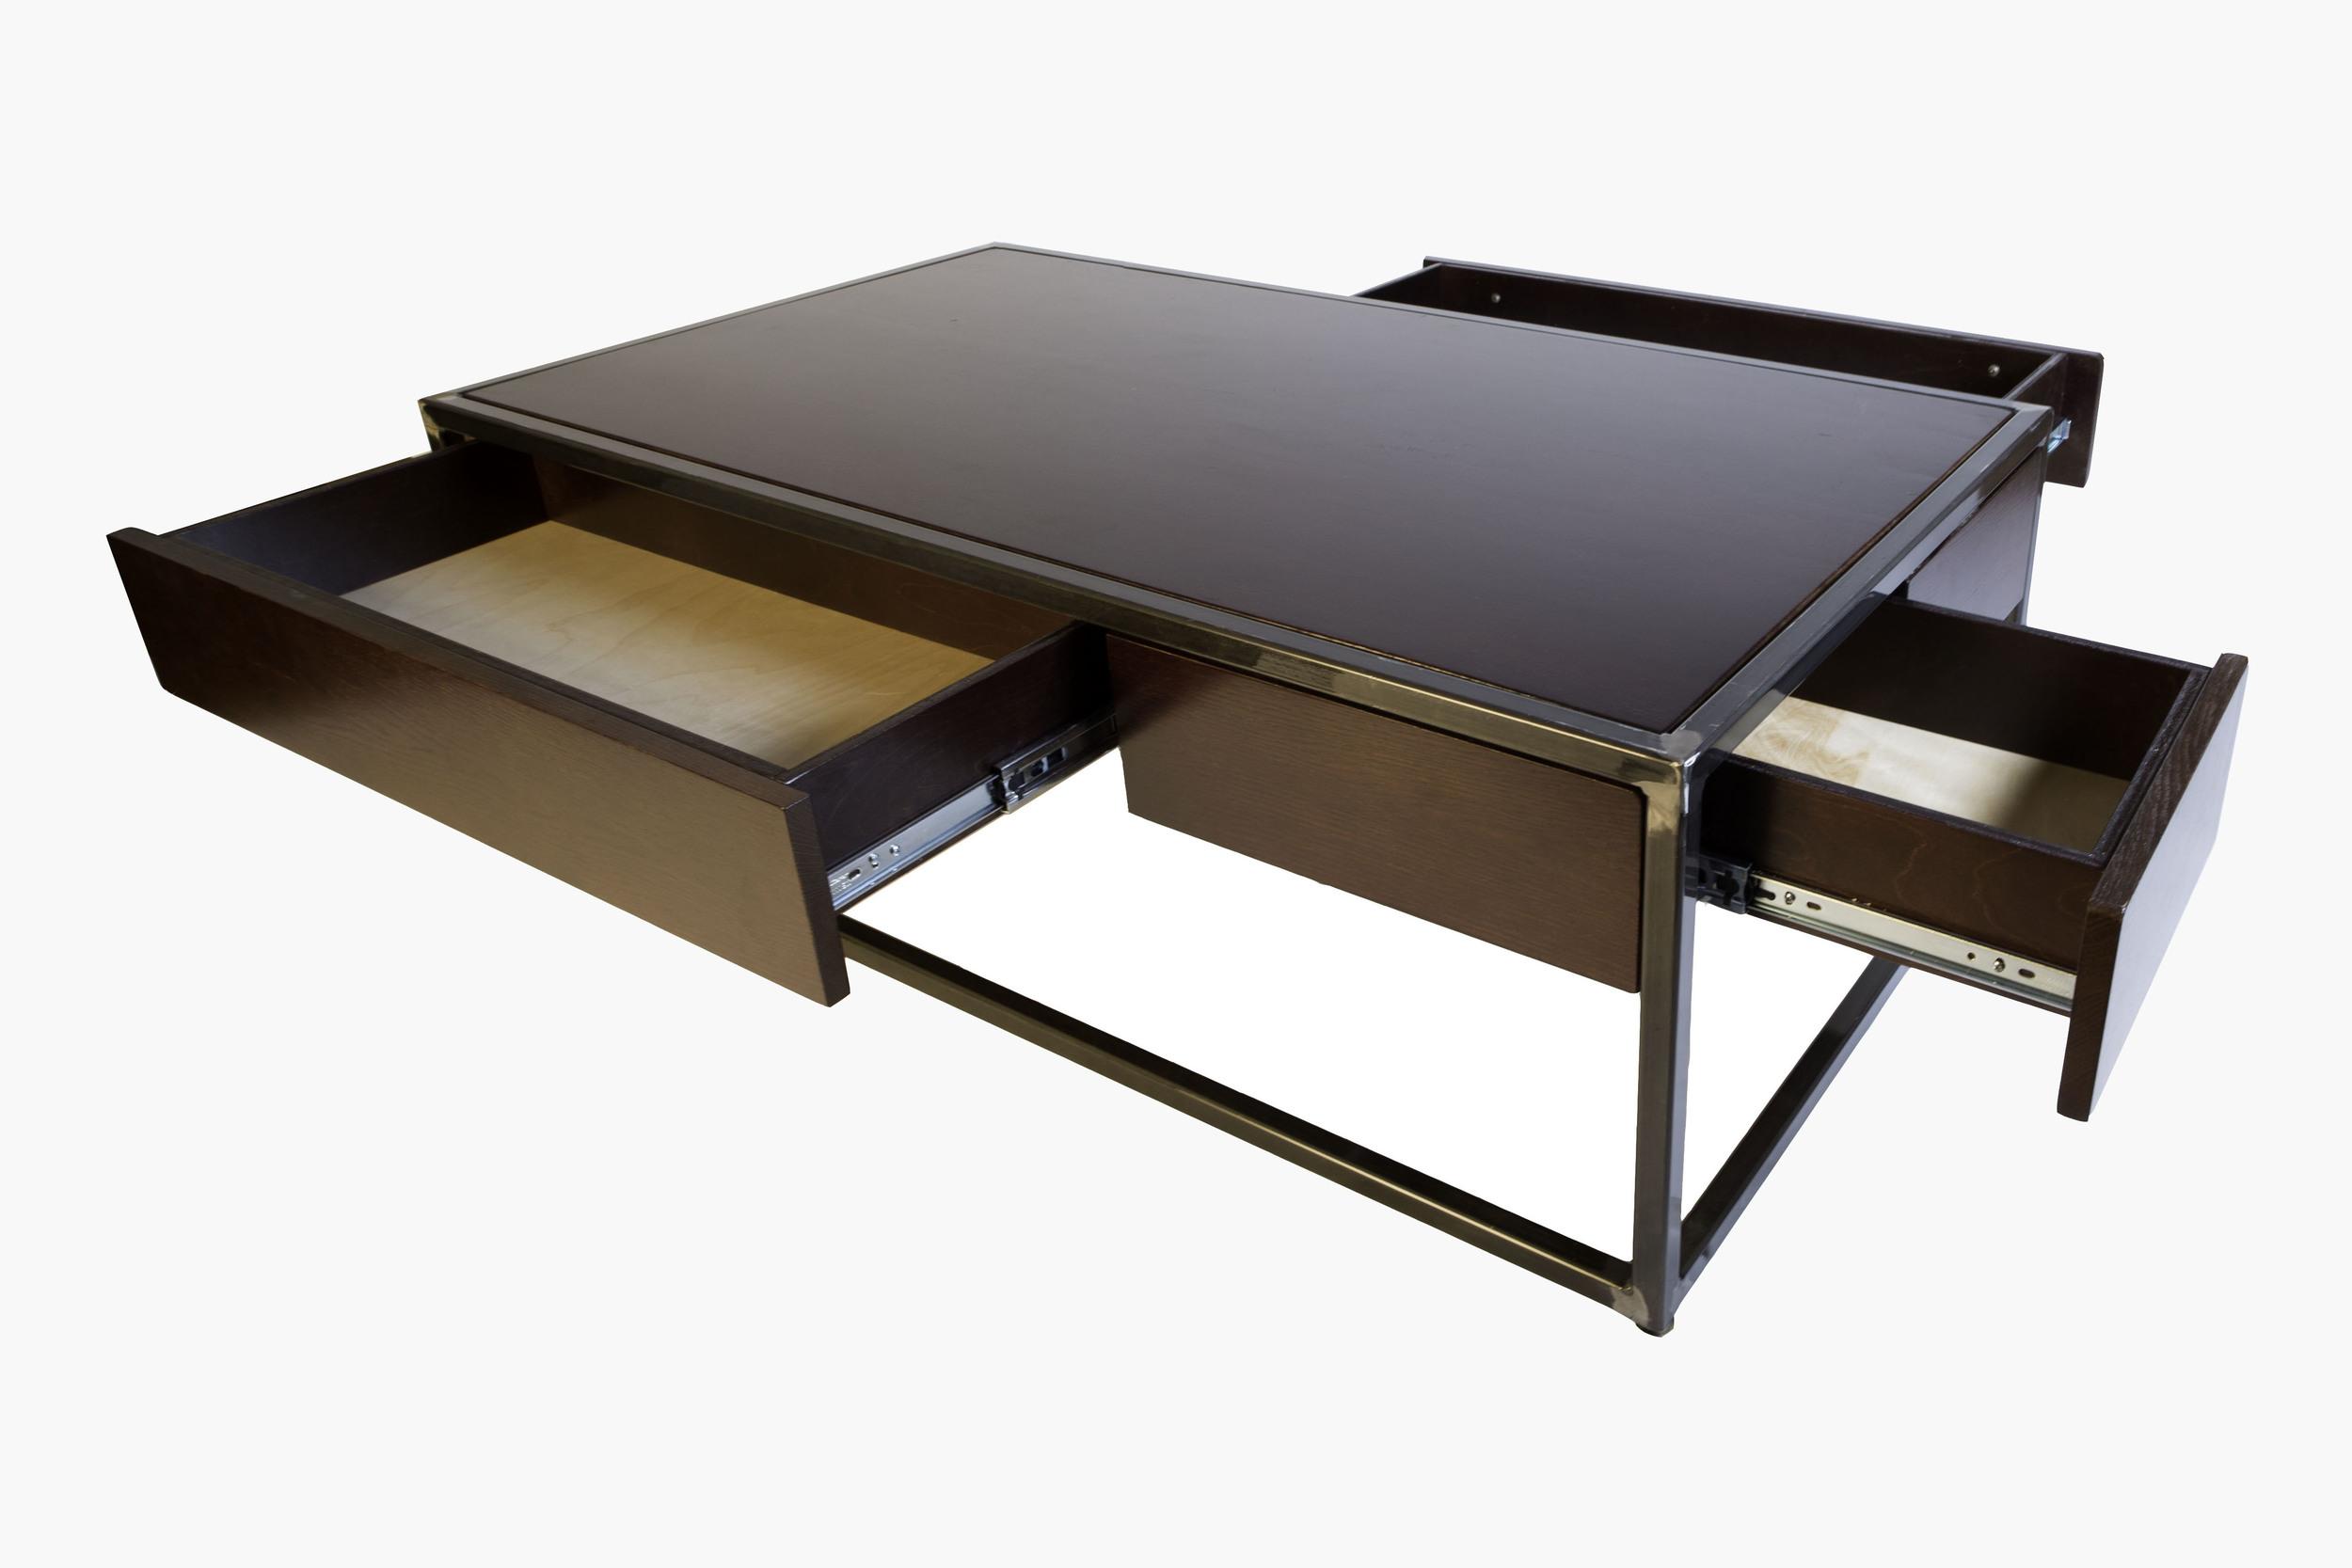 storage_table1grey.jpg